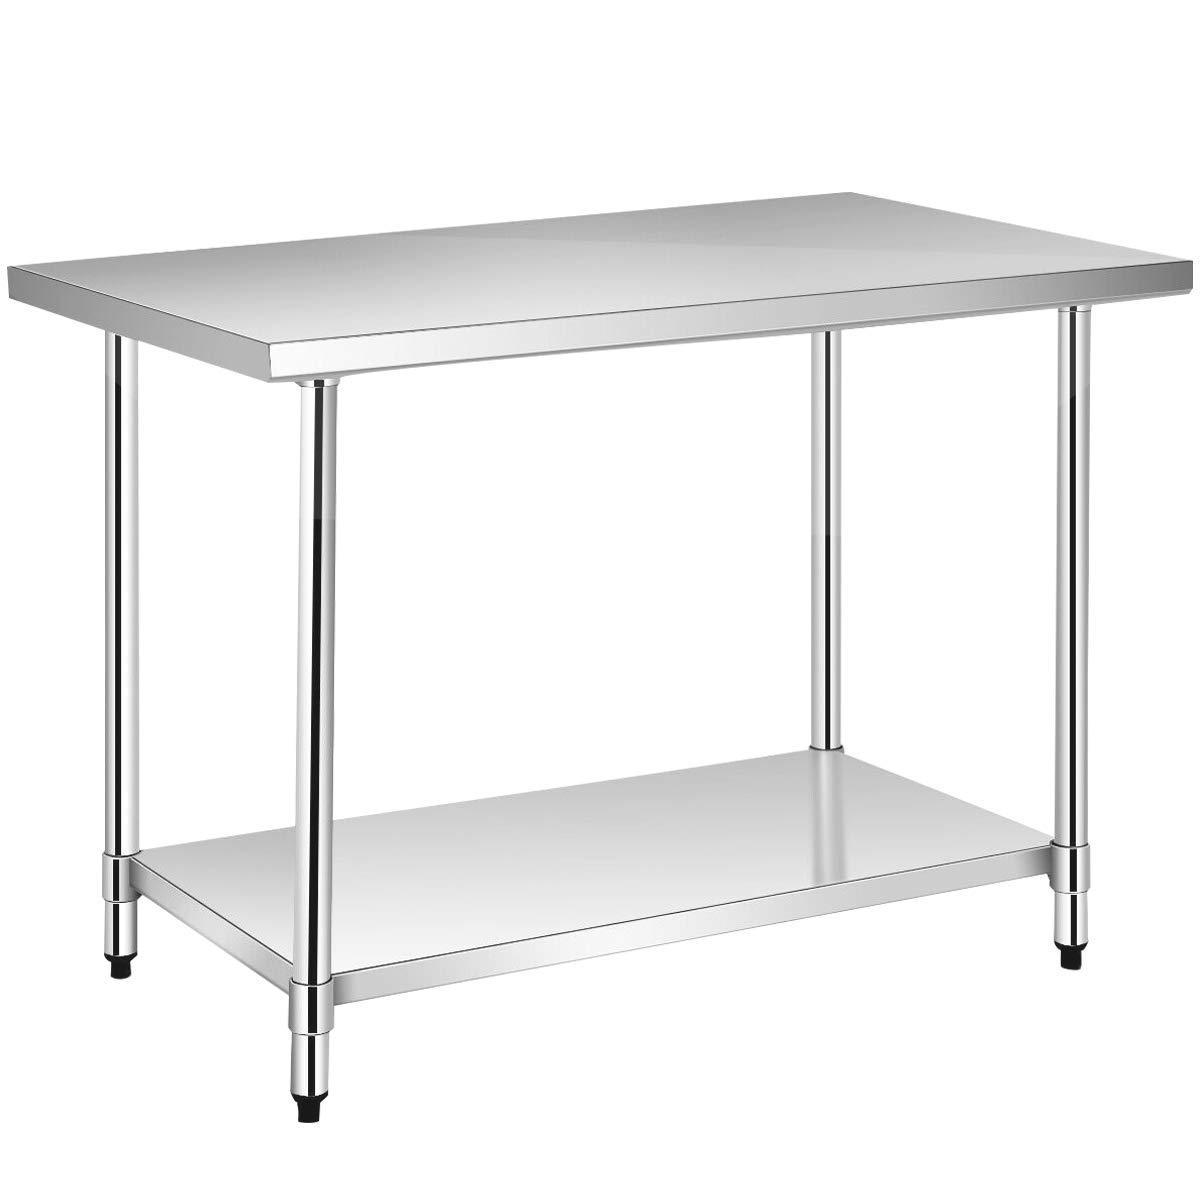 "WATERJOY 48"" x 30"" Stainless Steel Food Prep Table, NSF Commercial Kitchen Food Prep Worktable & Workstation, Adjustable Shelf"